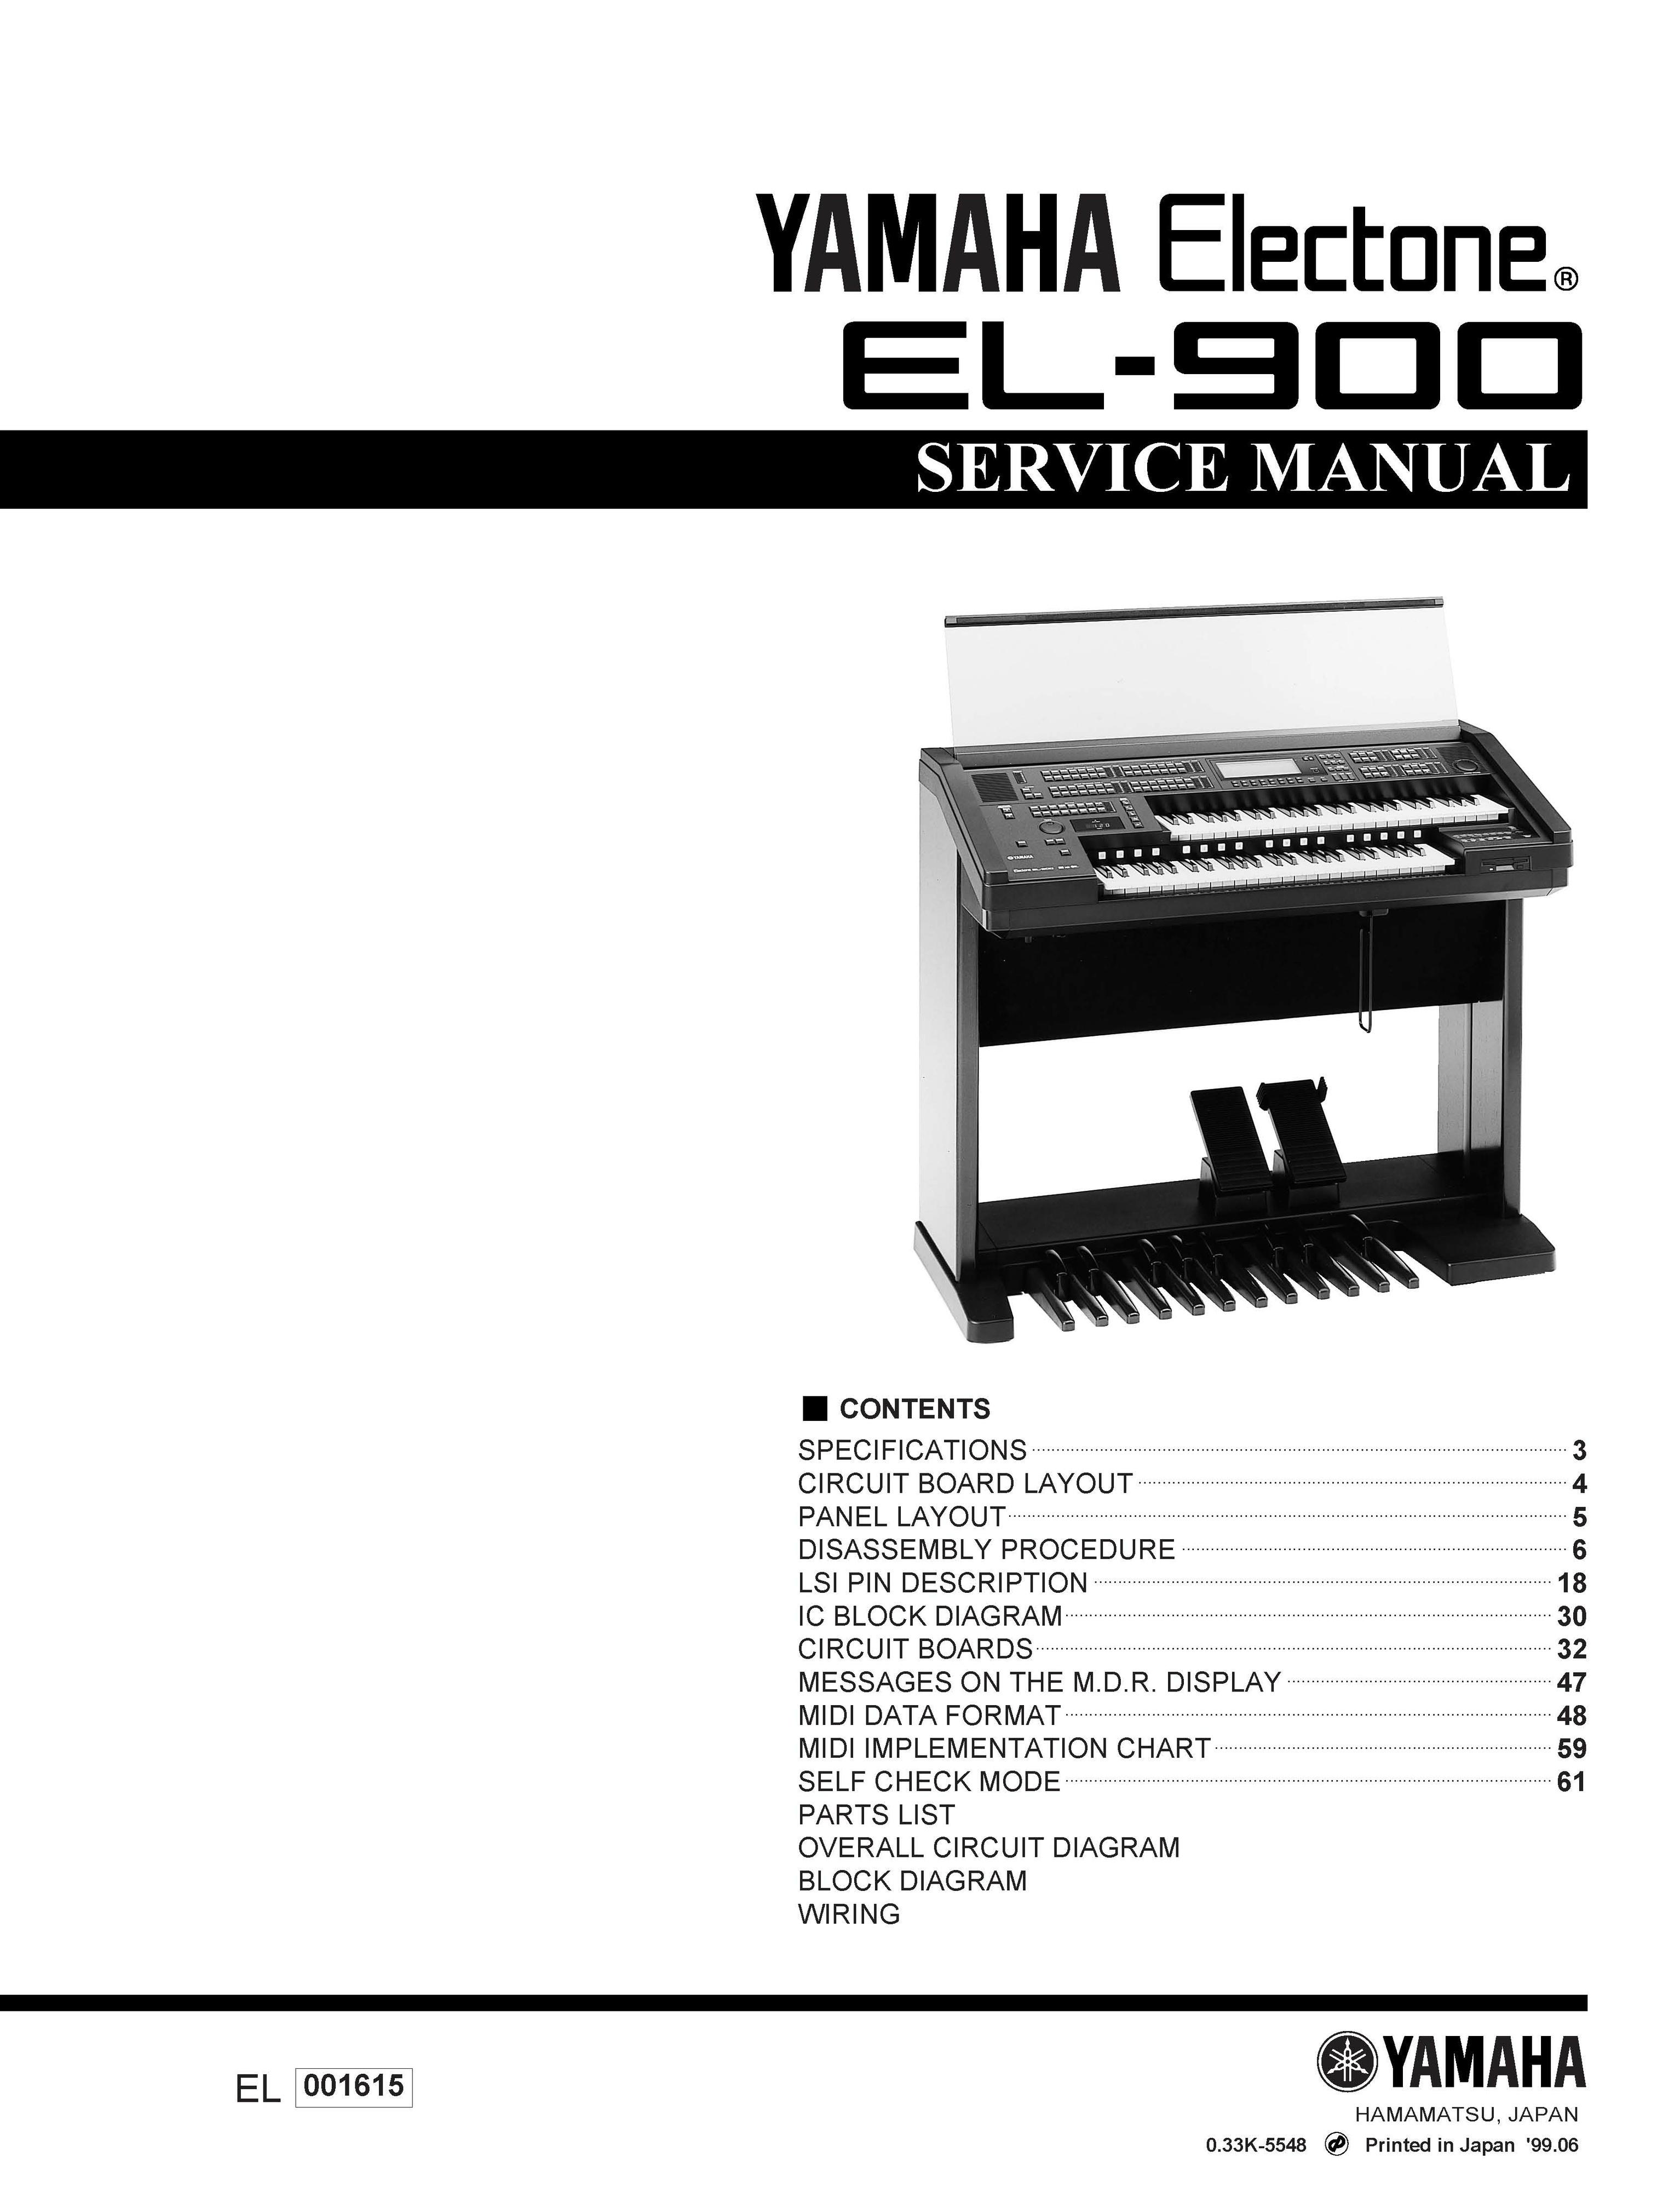 yamaha el900 gbr ivory m service manual music manuals rh sellfy com Parts Manual Service ManualsOnline